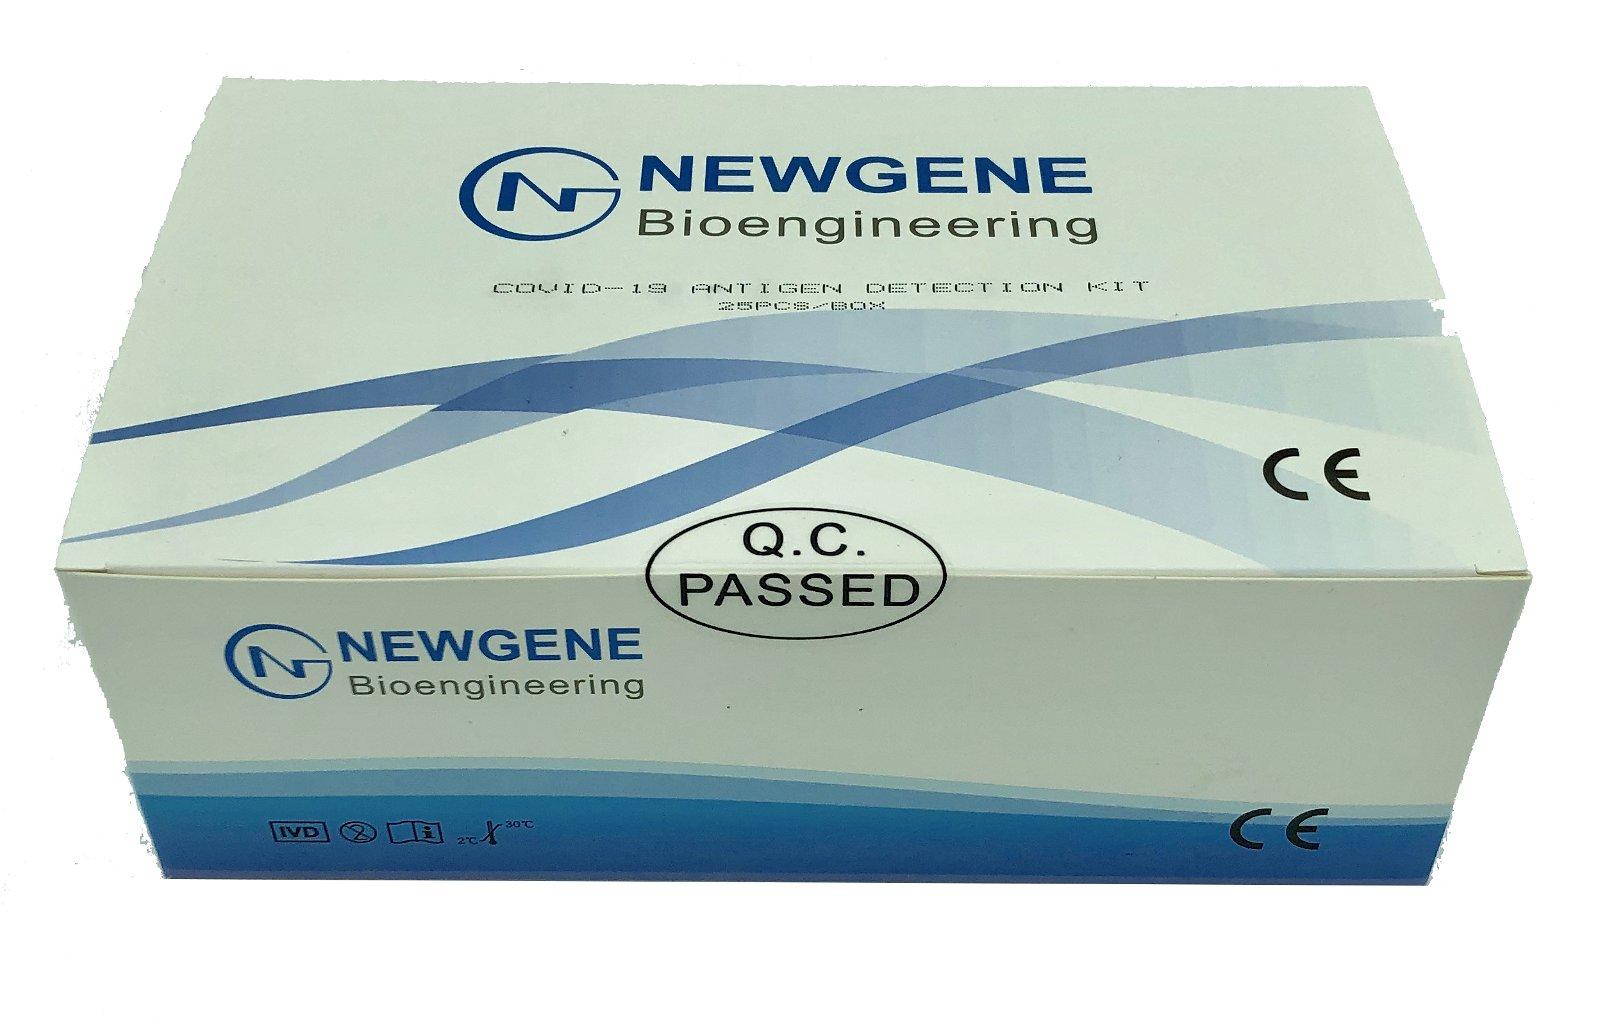 New Gene COVID-19 Antigen Kit